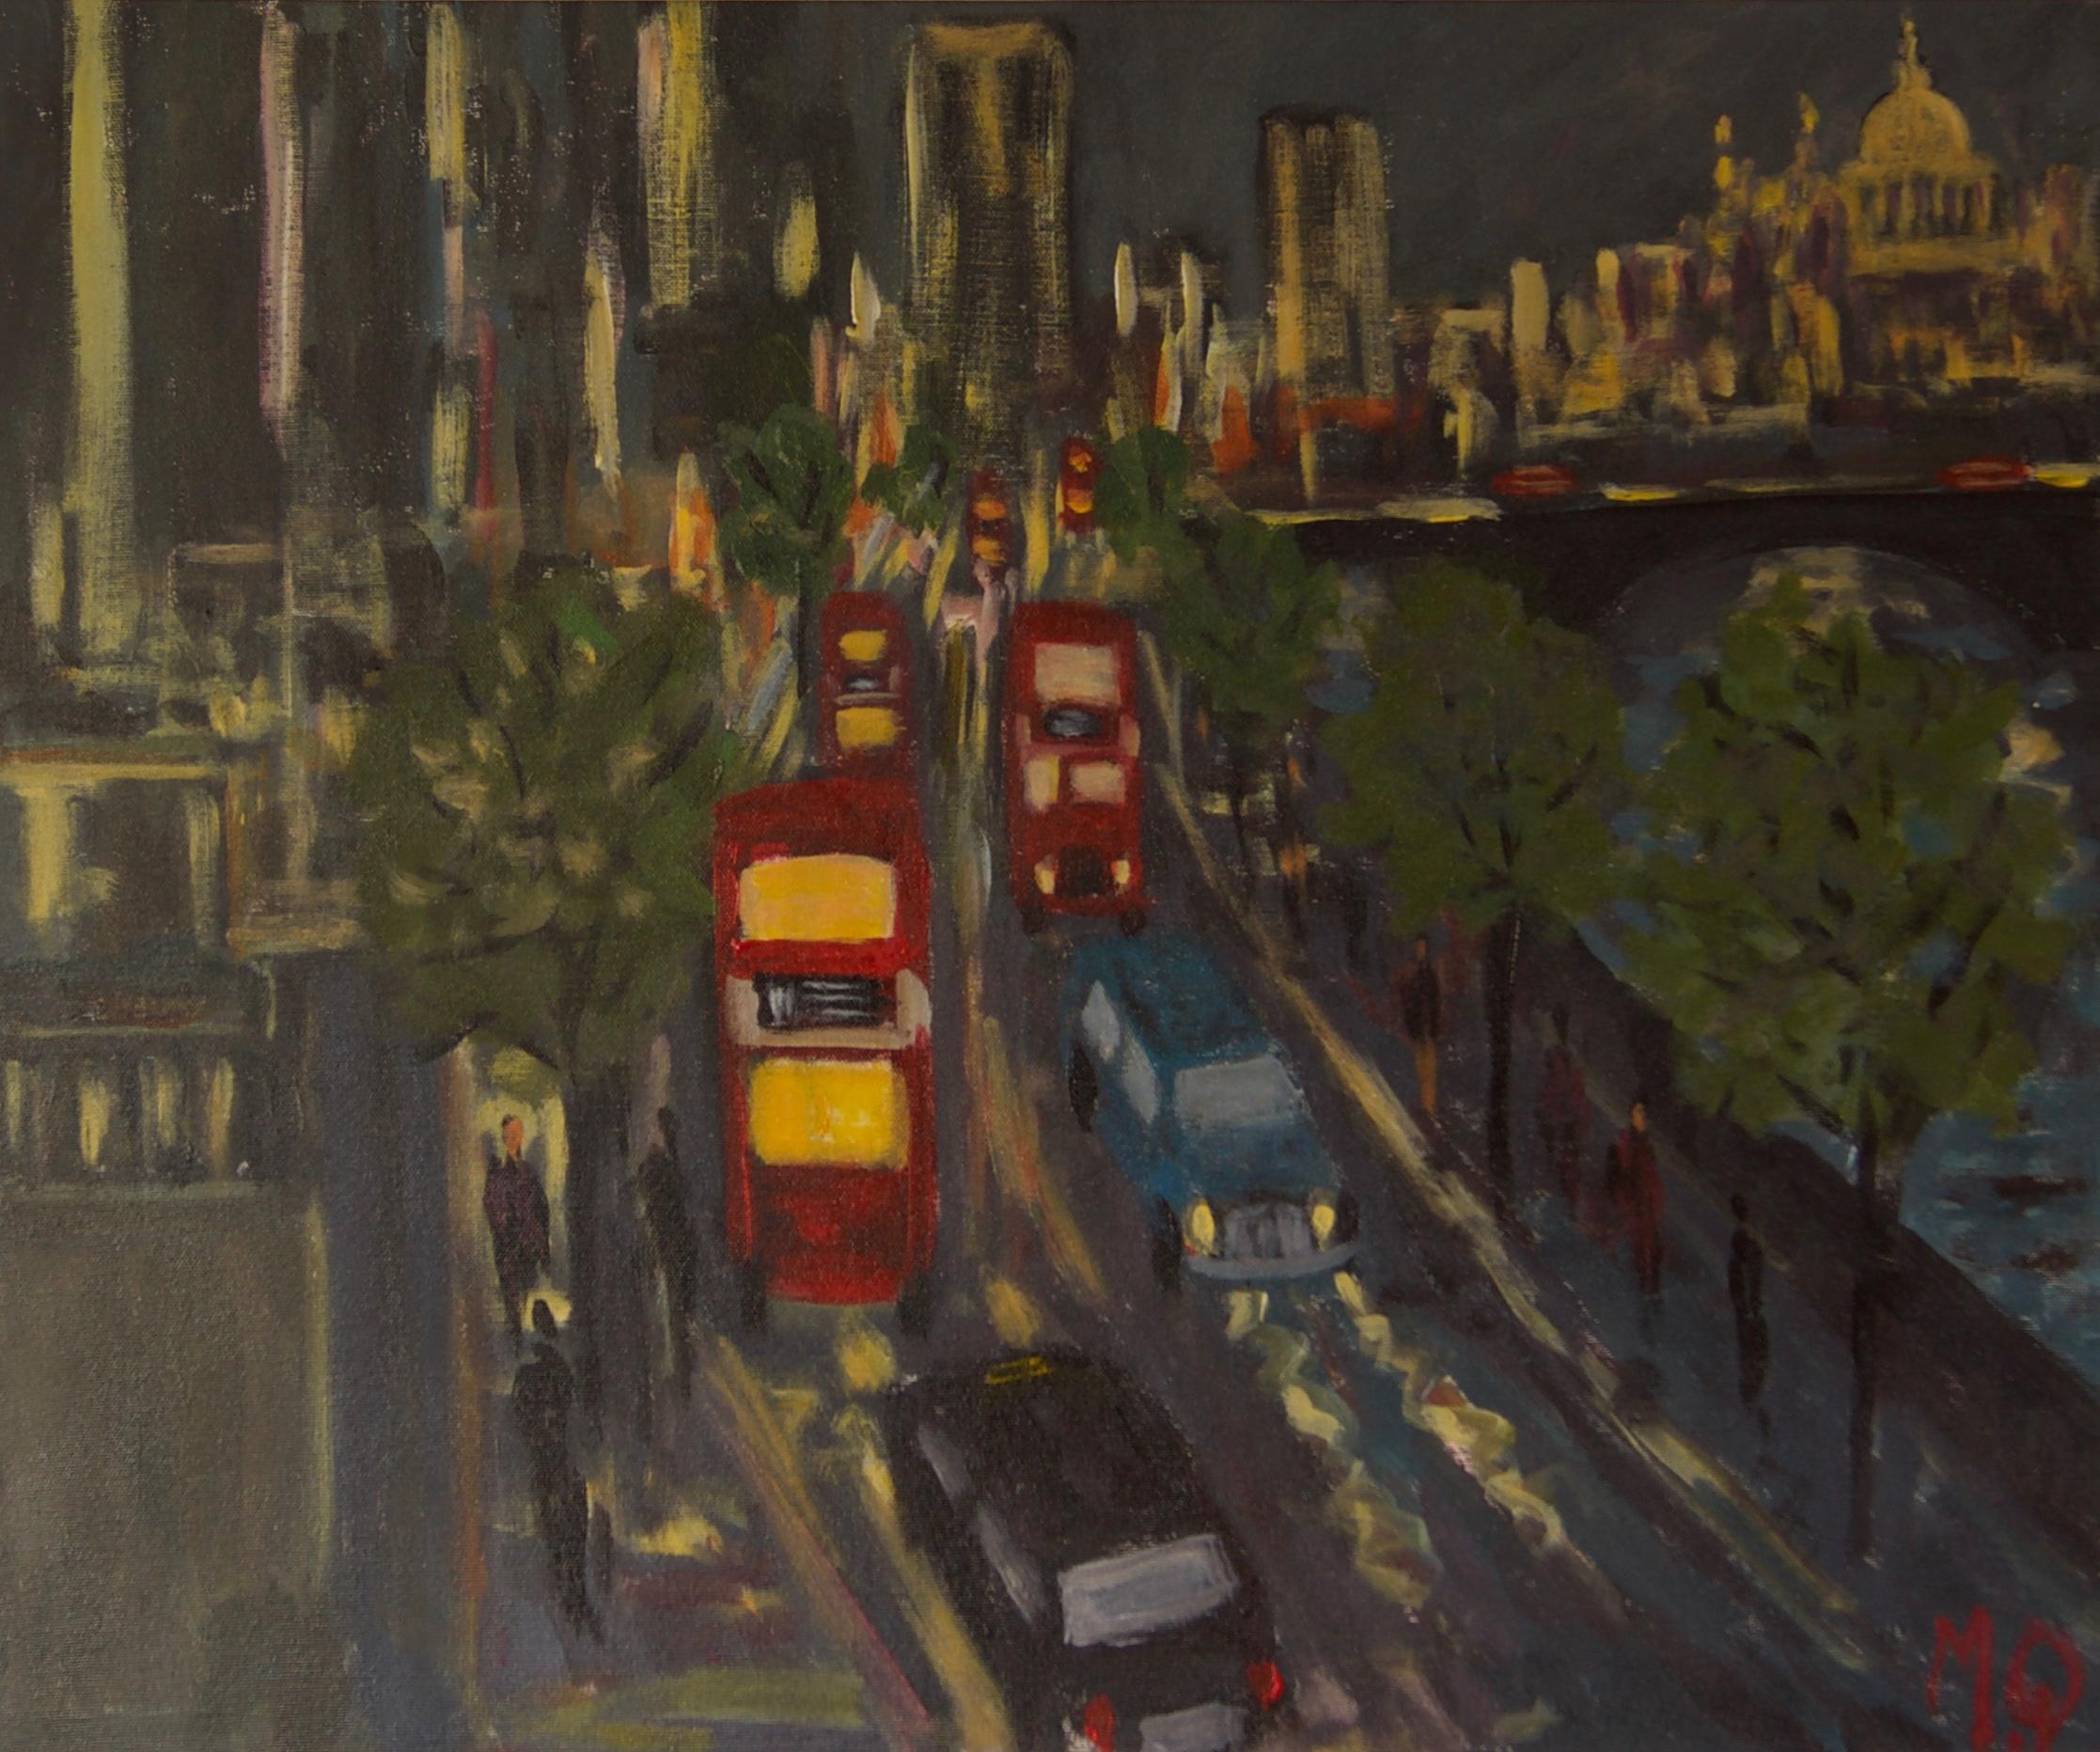 Evening Embankment - Late 20th Century Impressionist Acrylic Piece of London